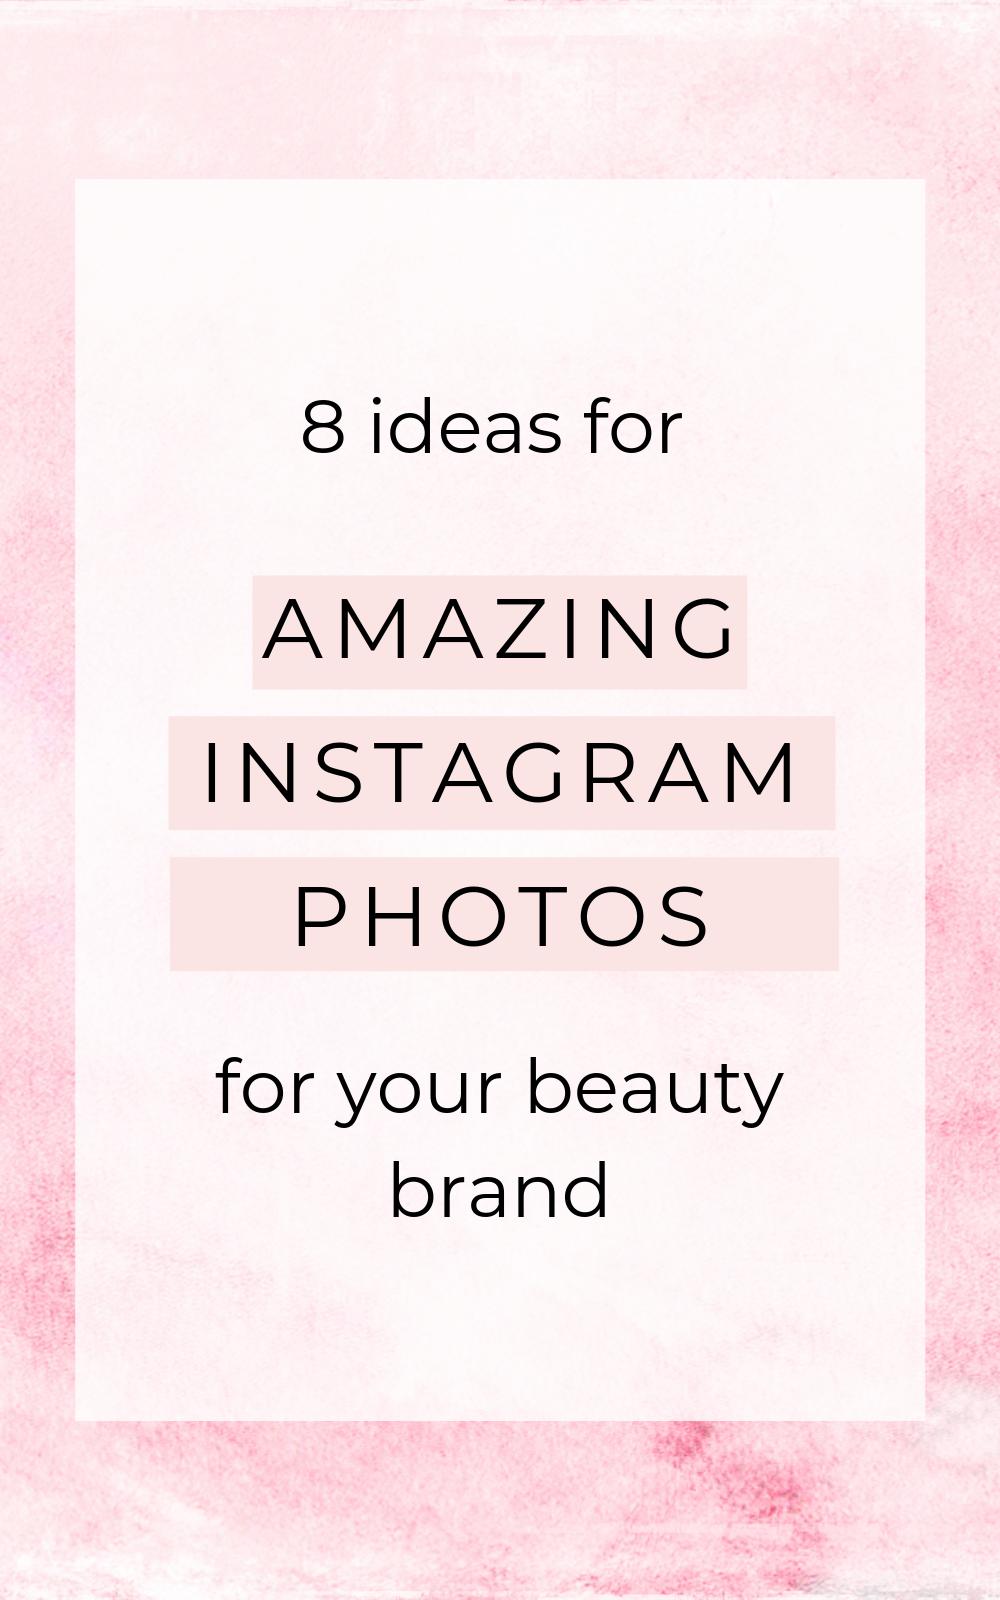 15 ideas for beautiful Instagram photos for your salon  Salon